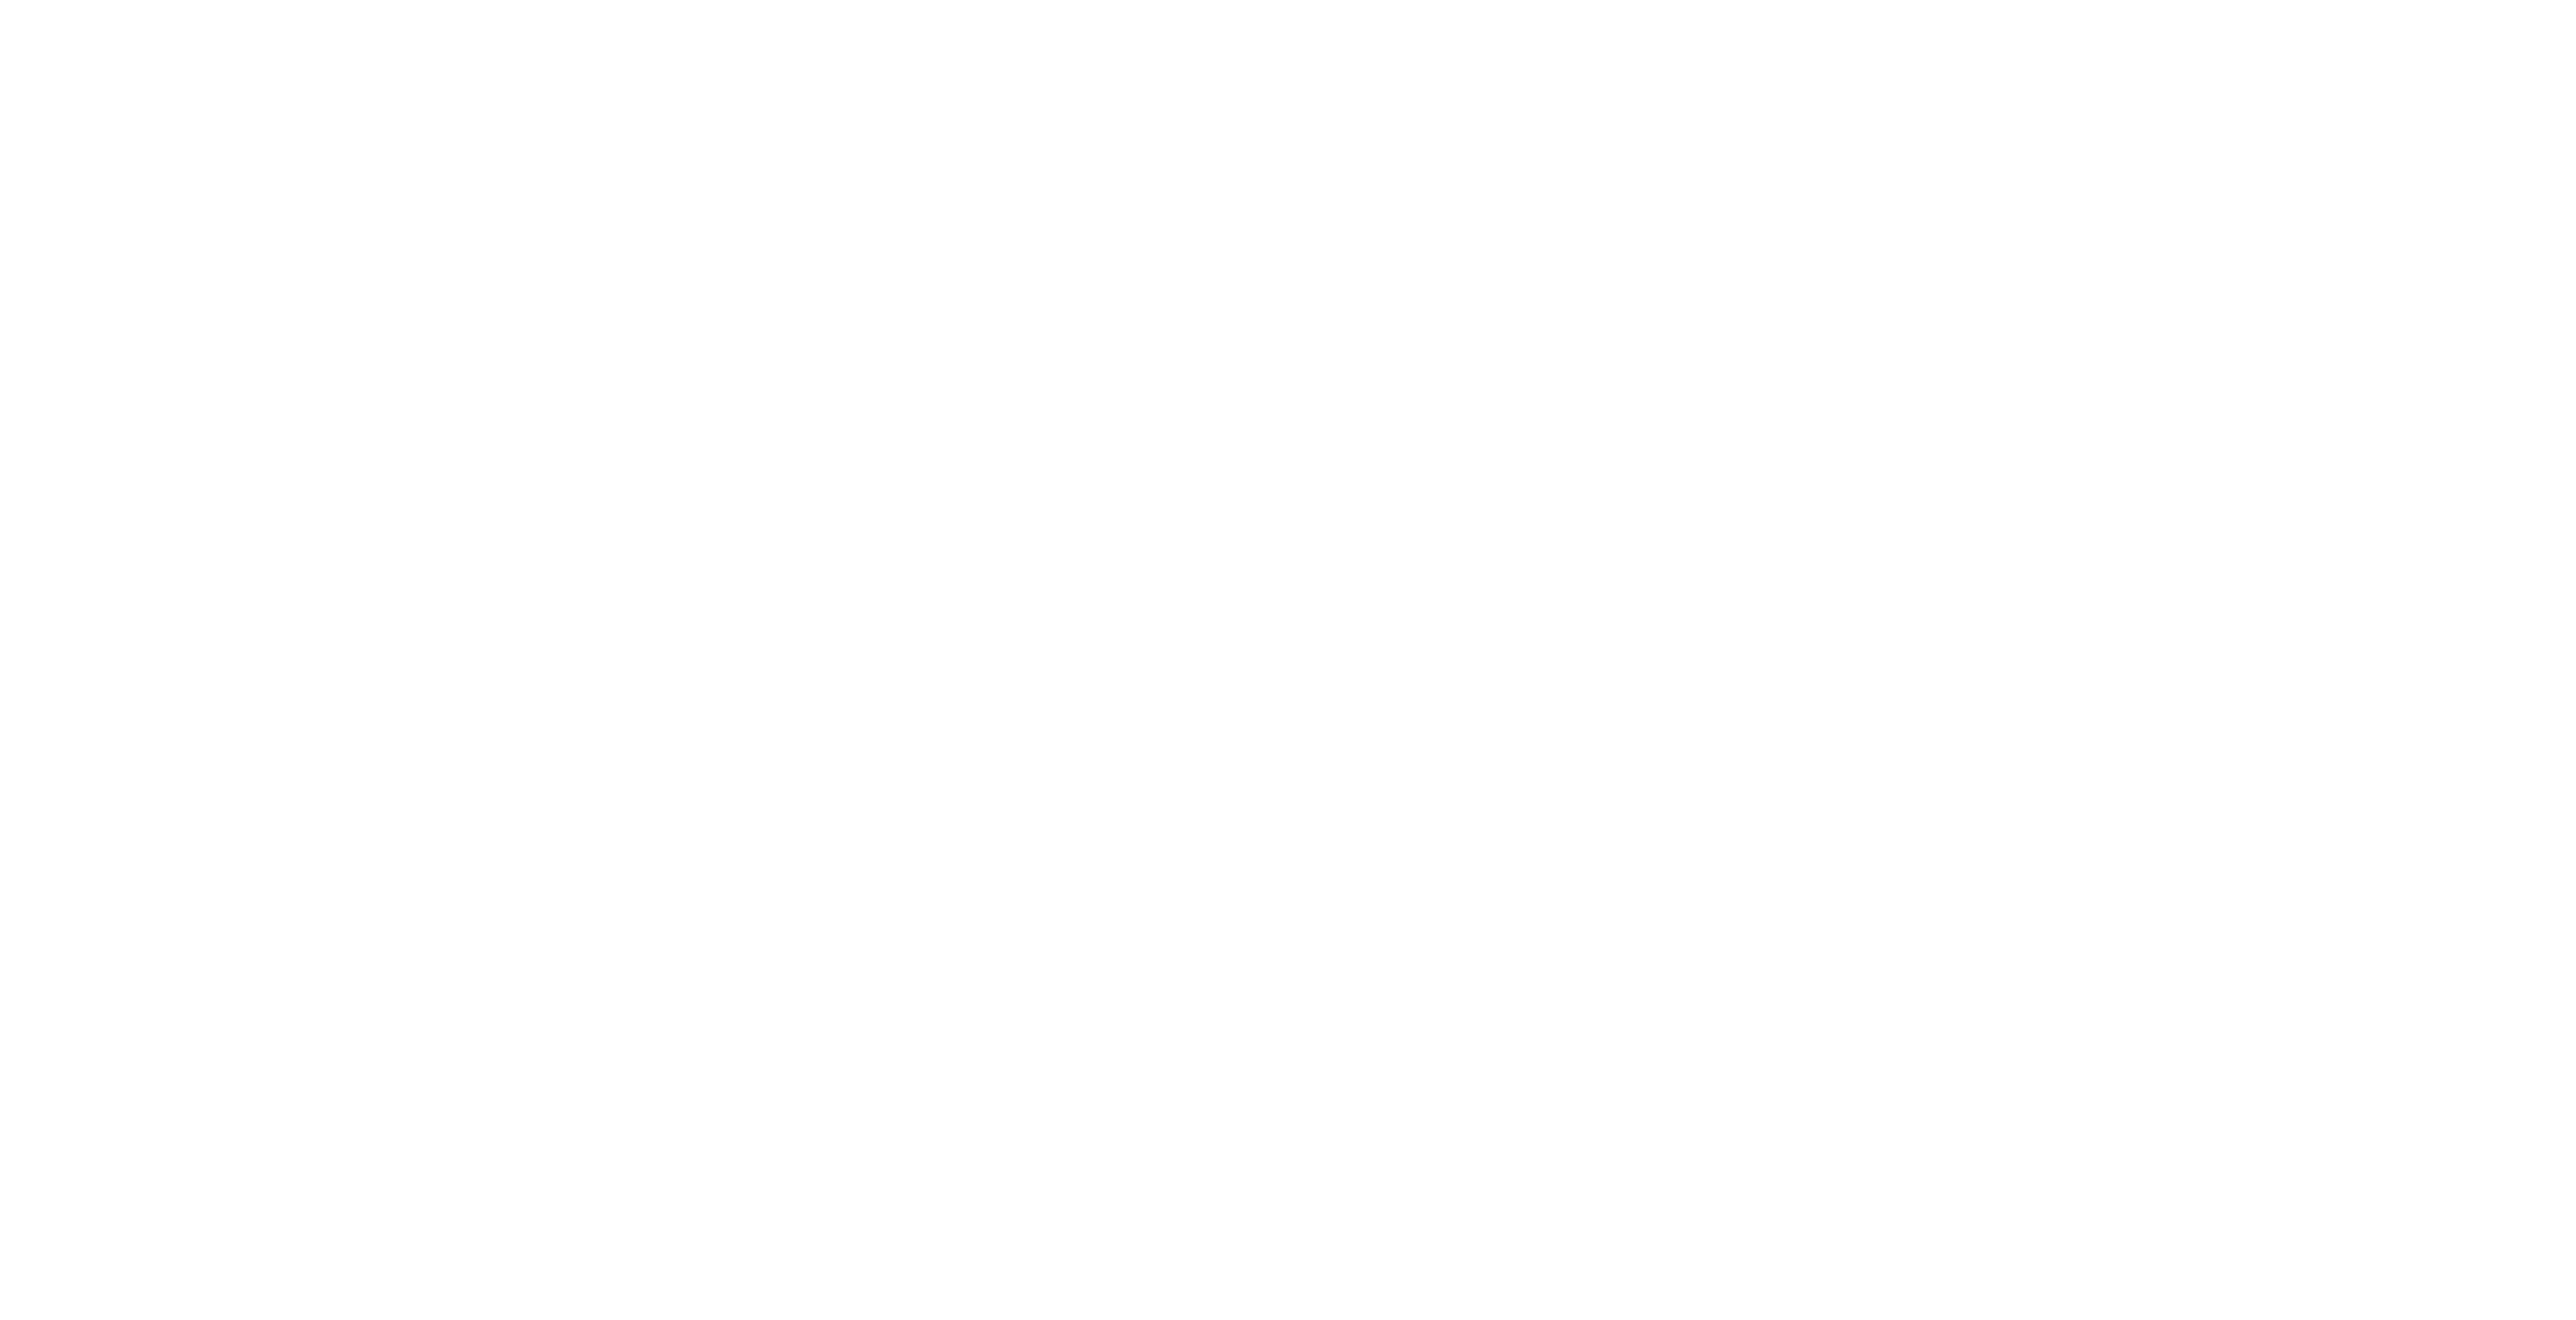 Agência de e-commerce